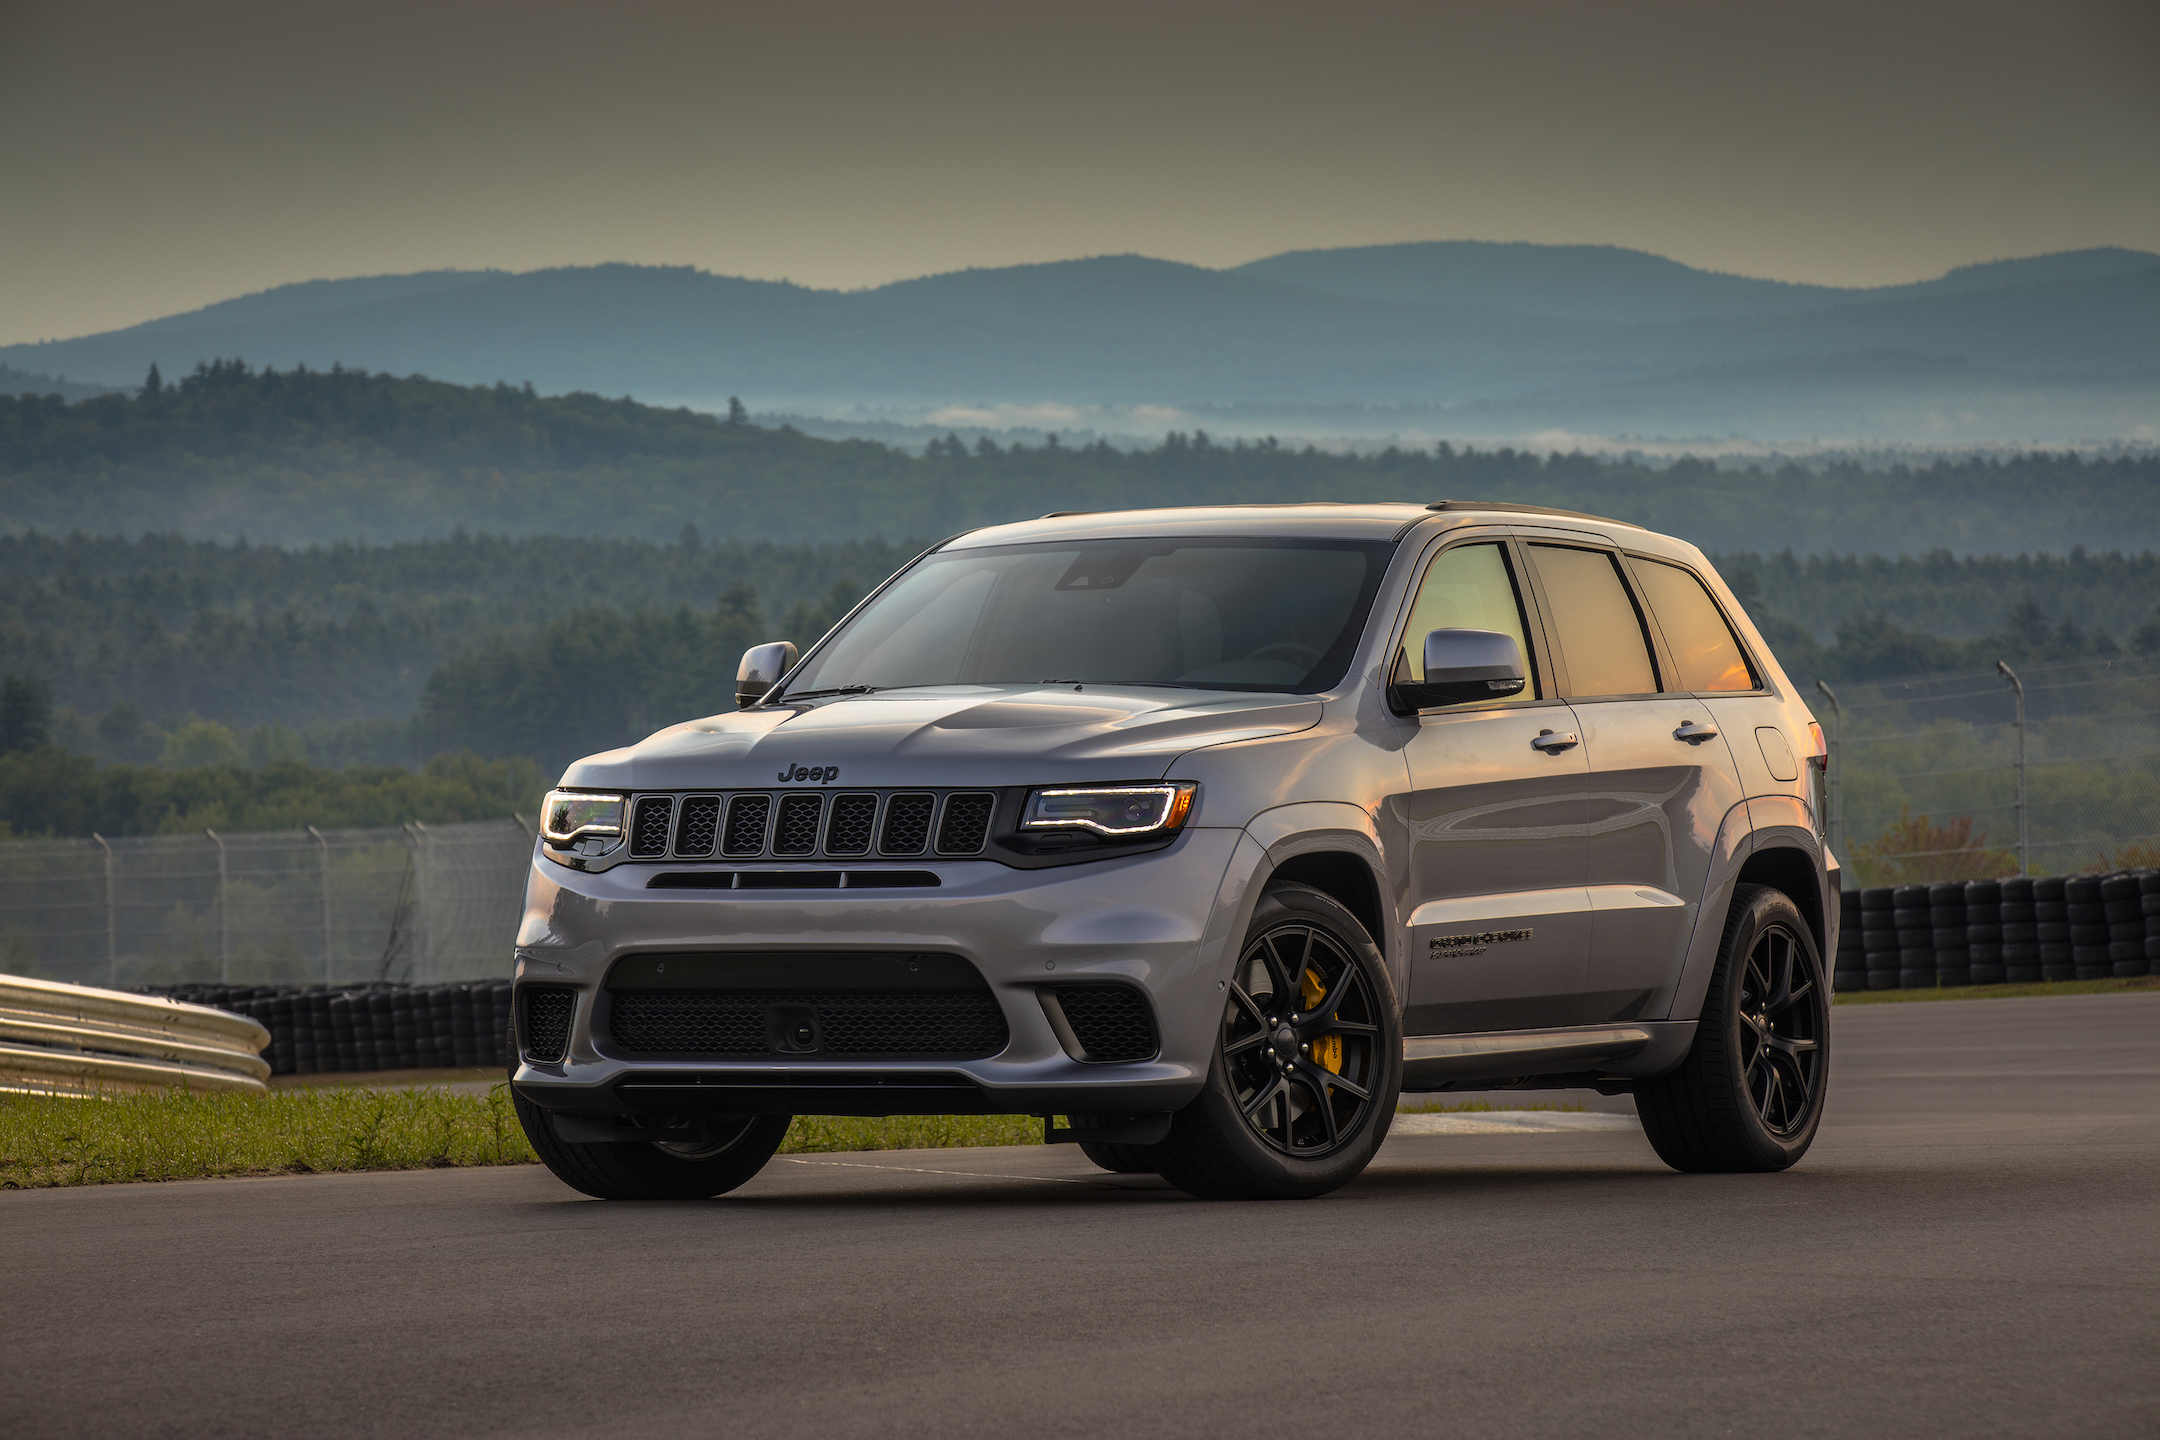 2019 Jeep® Grand Cherokee Trackhawk